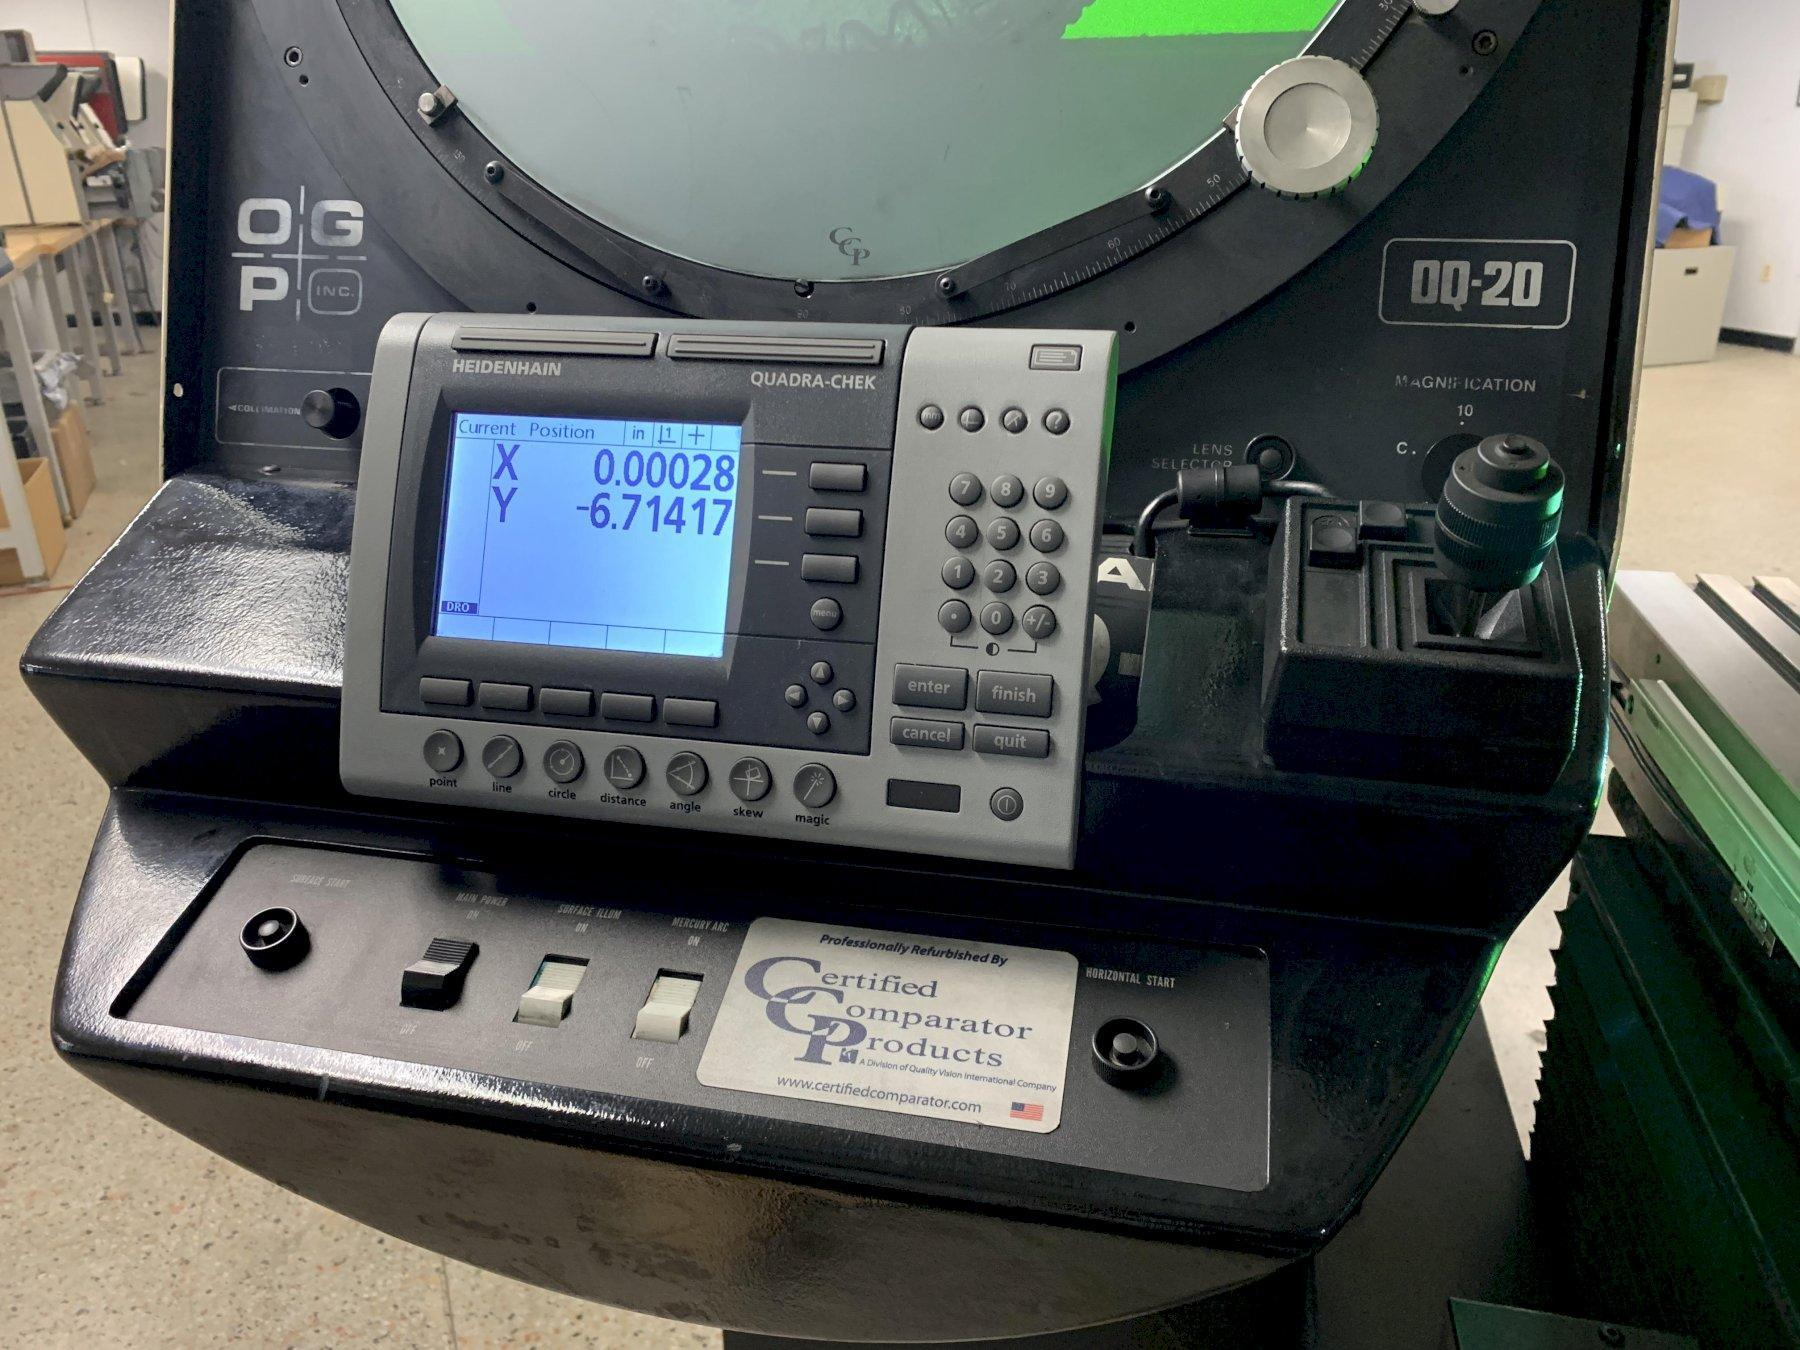 "20"" OGP (Optical Gaging Prodcuts) Model OQ20 Optical Comparator & Measuring Machine, S/N OQ200154."